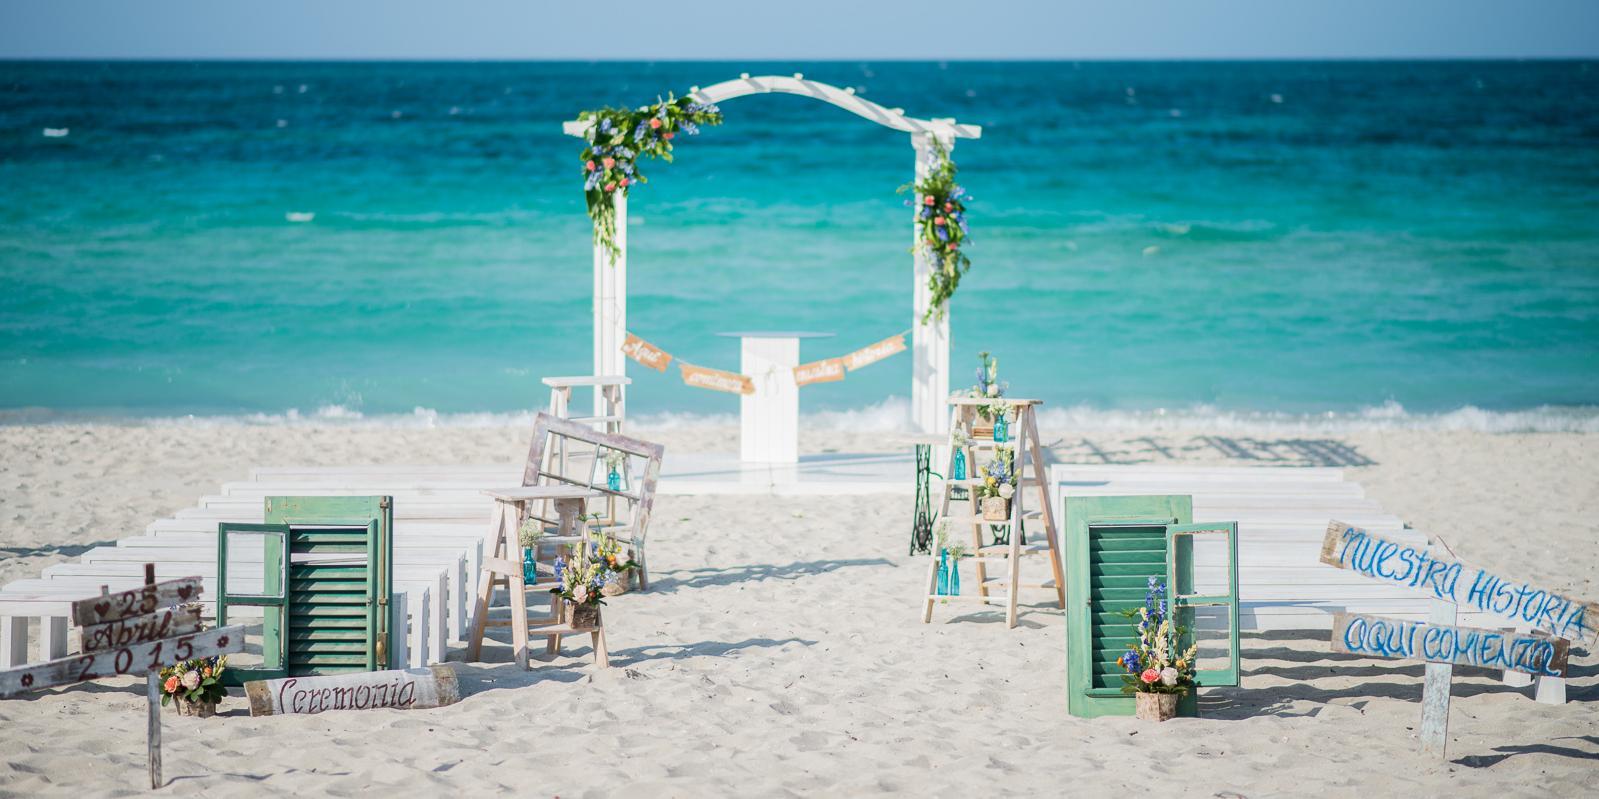 bodas-rustico-playa-cuba-6091.jpg